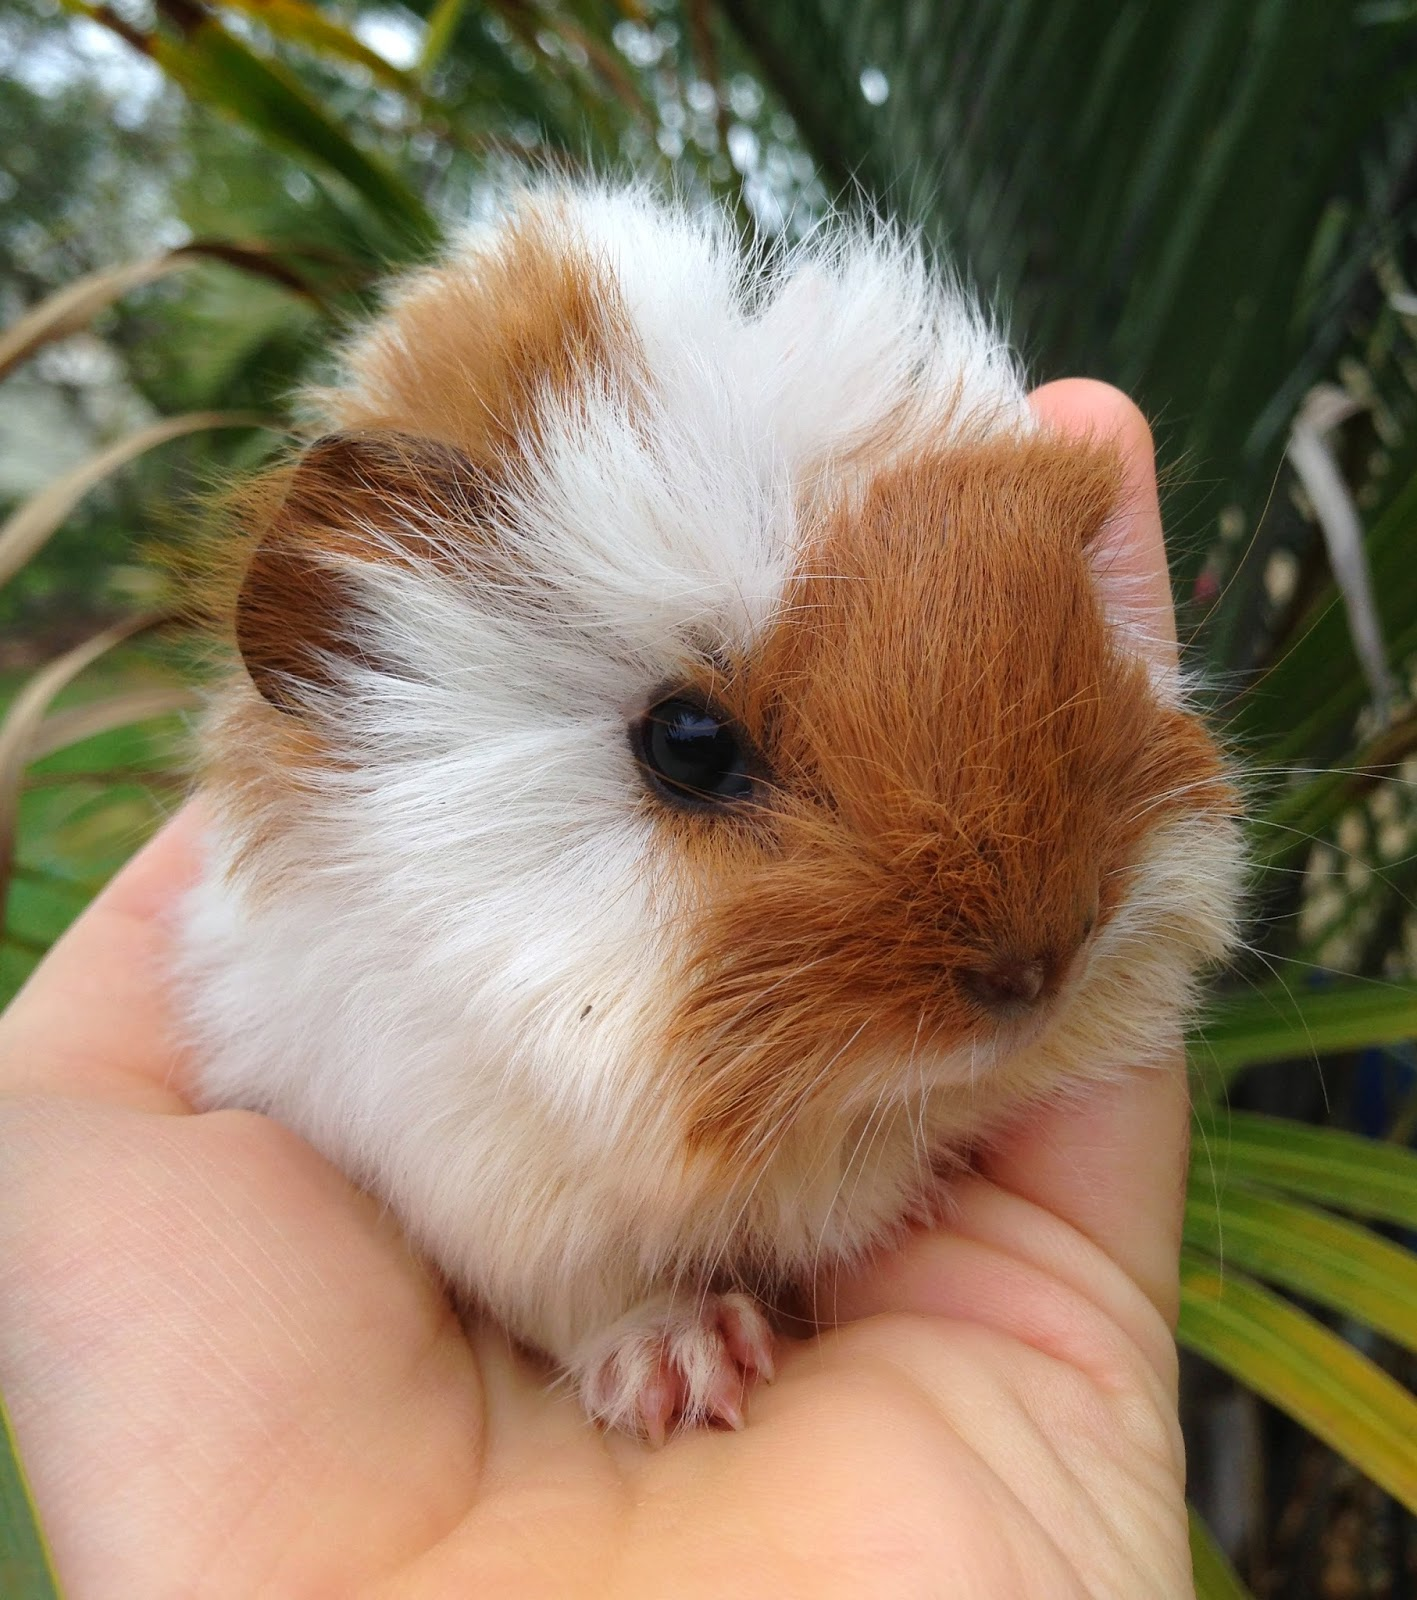 Free Guinea Pig & Pet Images - Pixabay